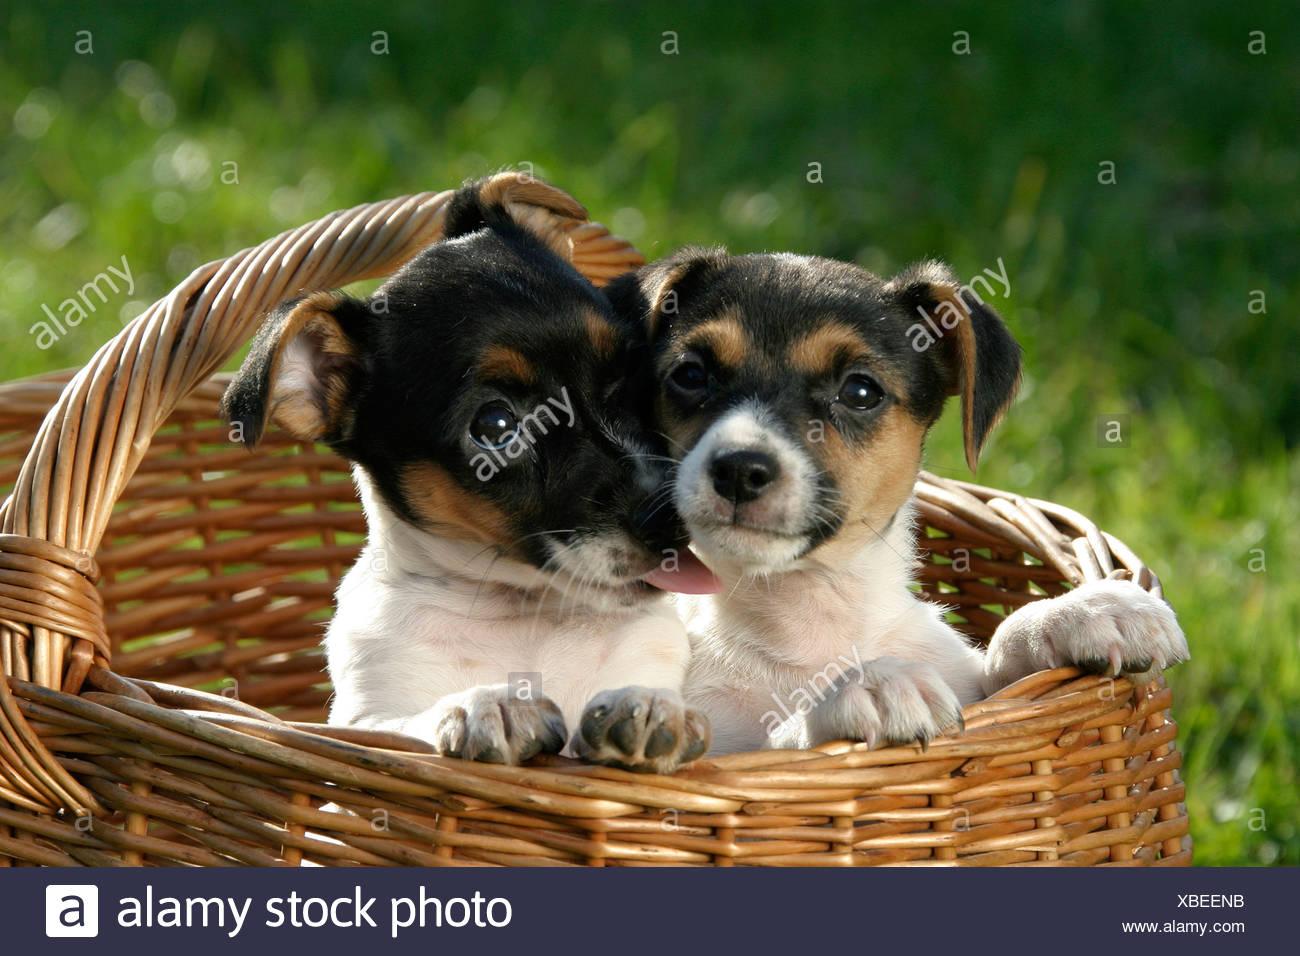 Zwei Jack Russell Terrier Welpen im Korb Stockfoto, Bild